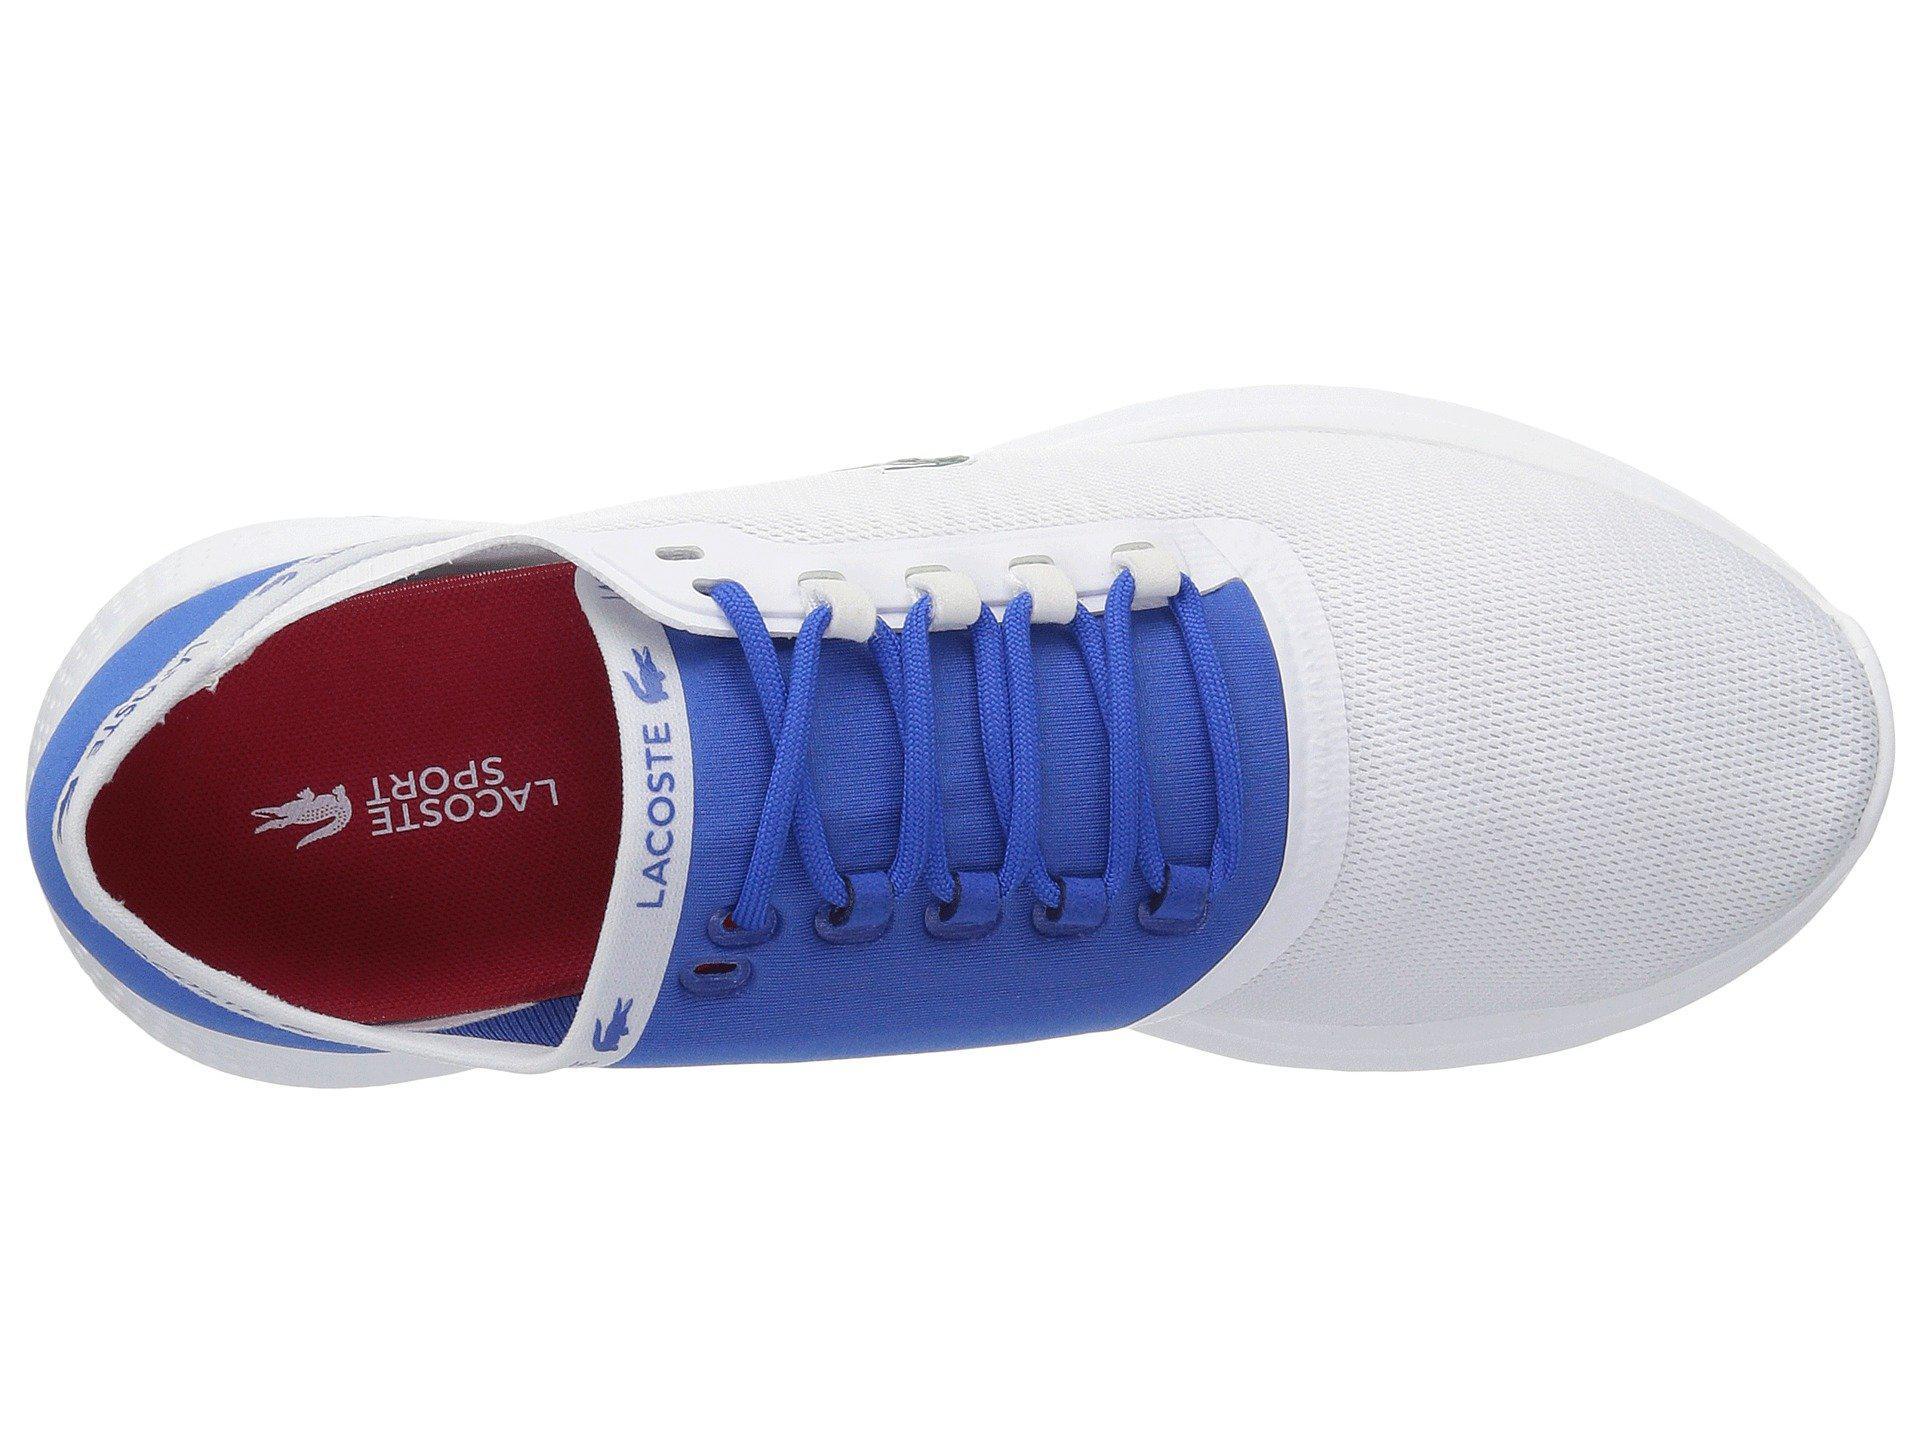 6526c611d Lacoste - Blue Lt Fit 118 4 (black dark Grey) Men s Shoes for. View  fullscreen